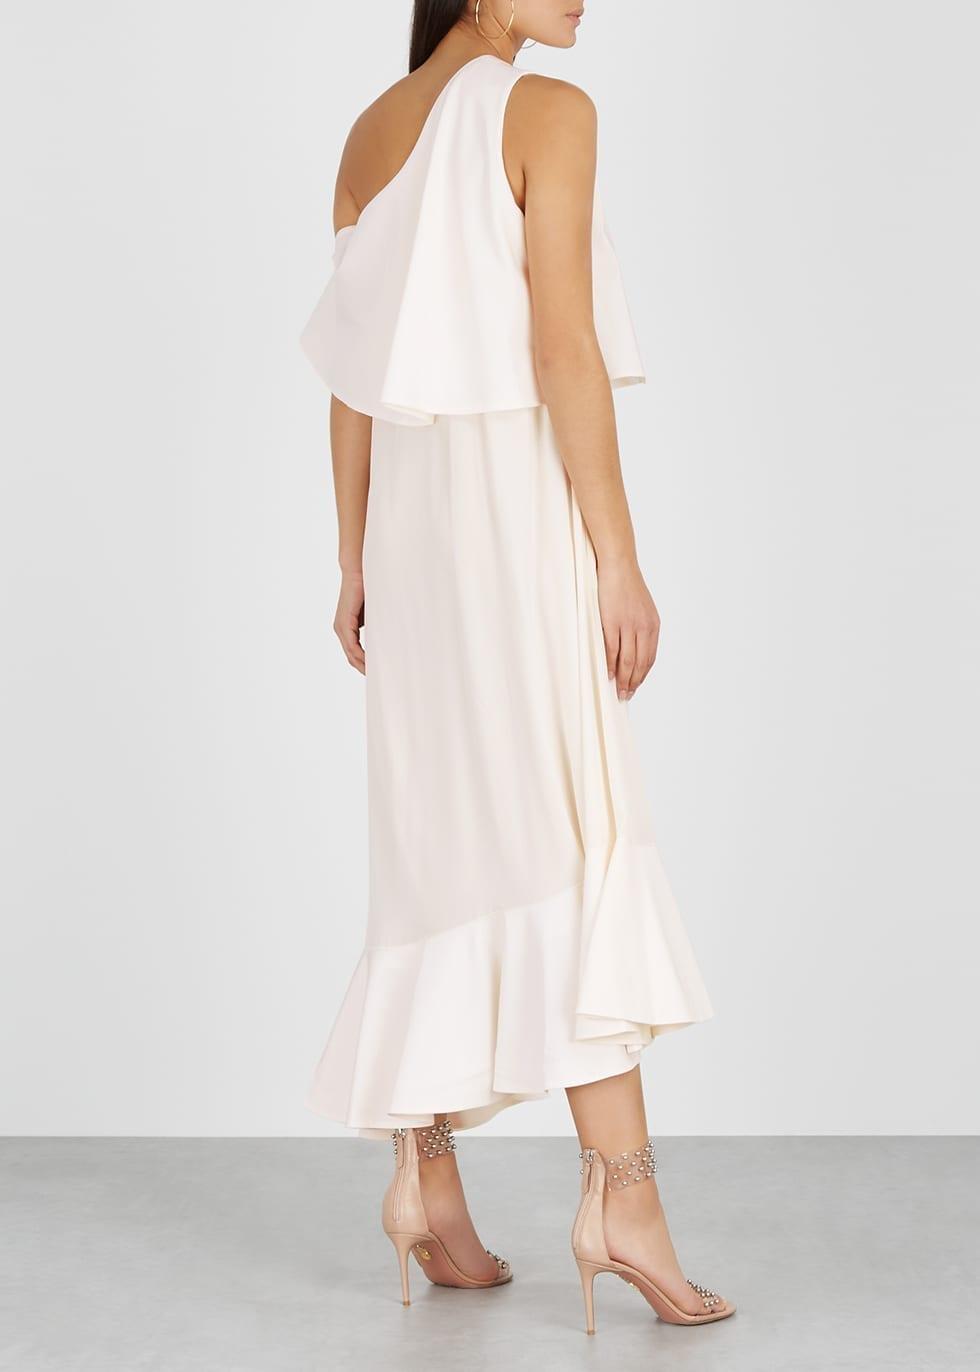 c956481fb STELLA MCCARTNEY One-shoulder Silk Crepe De Chine Cream Dress - We ...